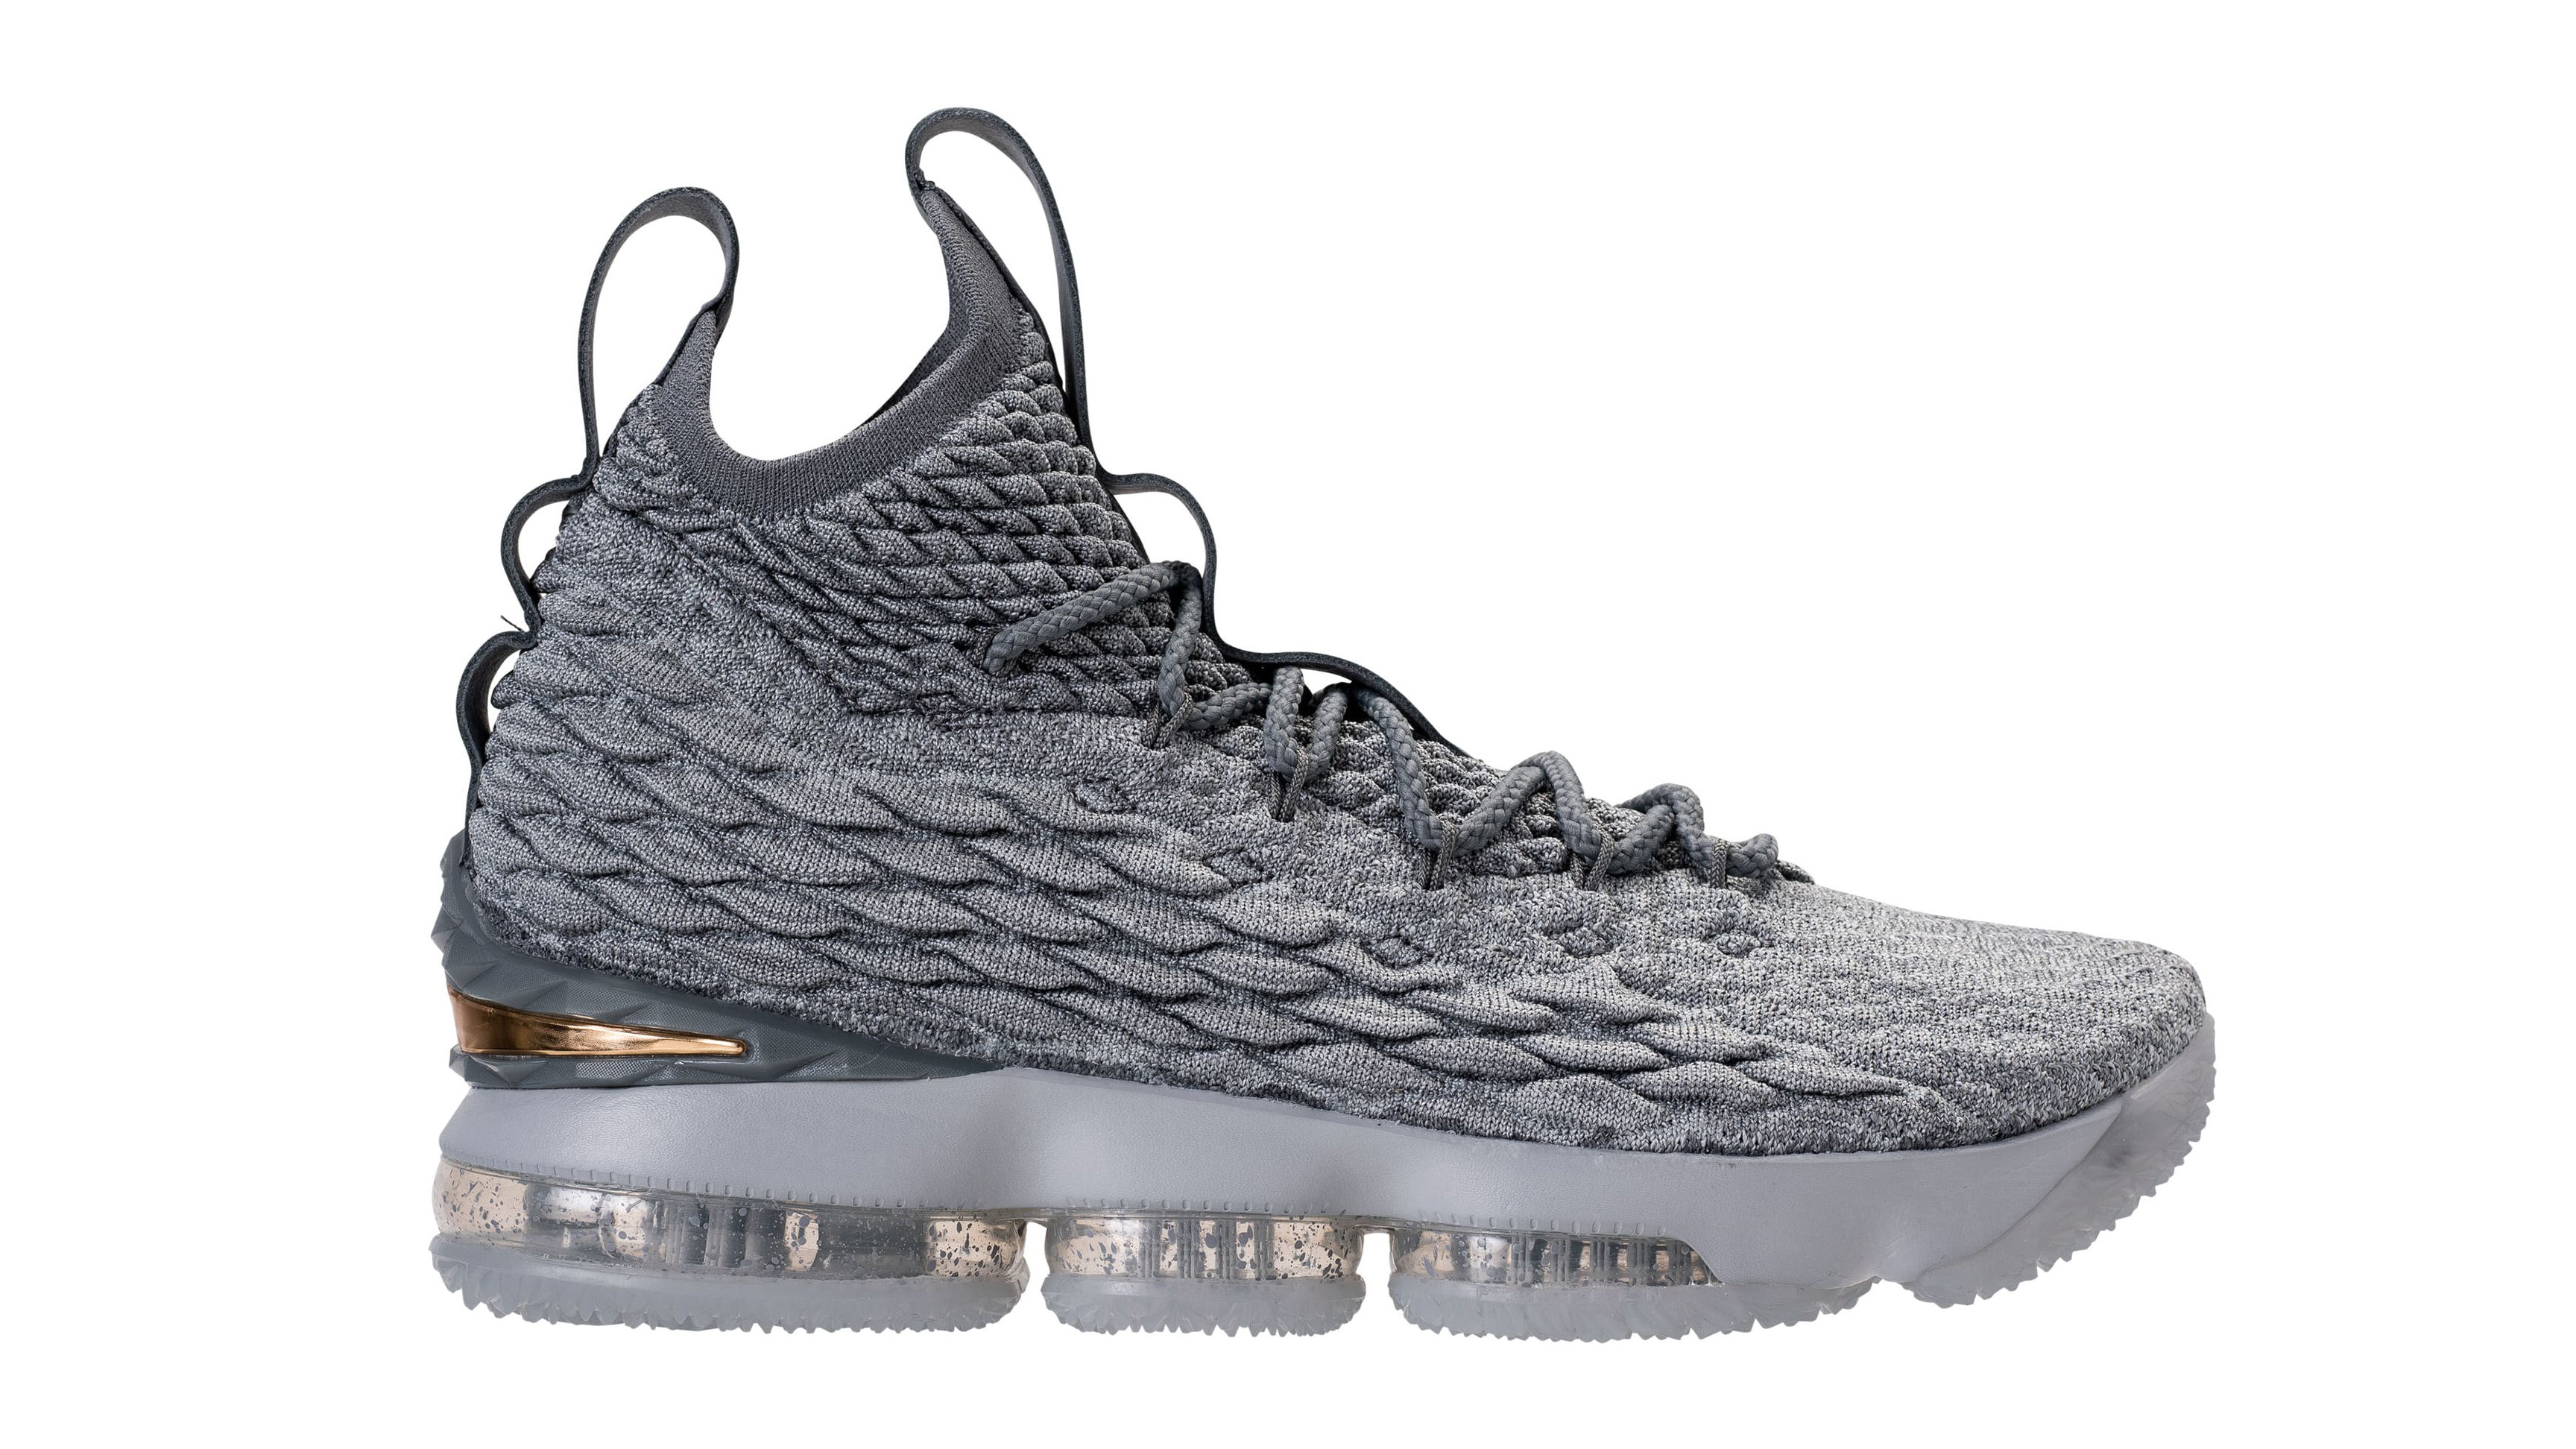 0b781e1060618 Nike LeBron 15 Grey Gold Release Date 897648-005